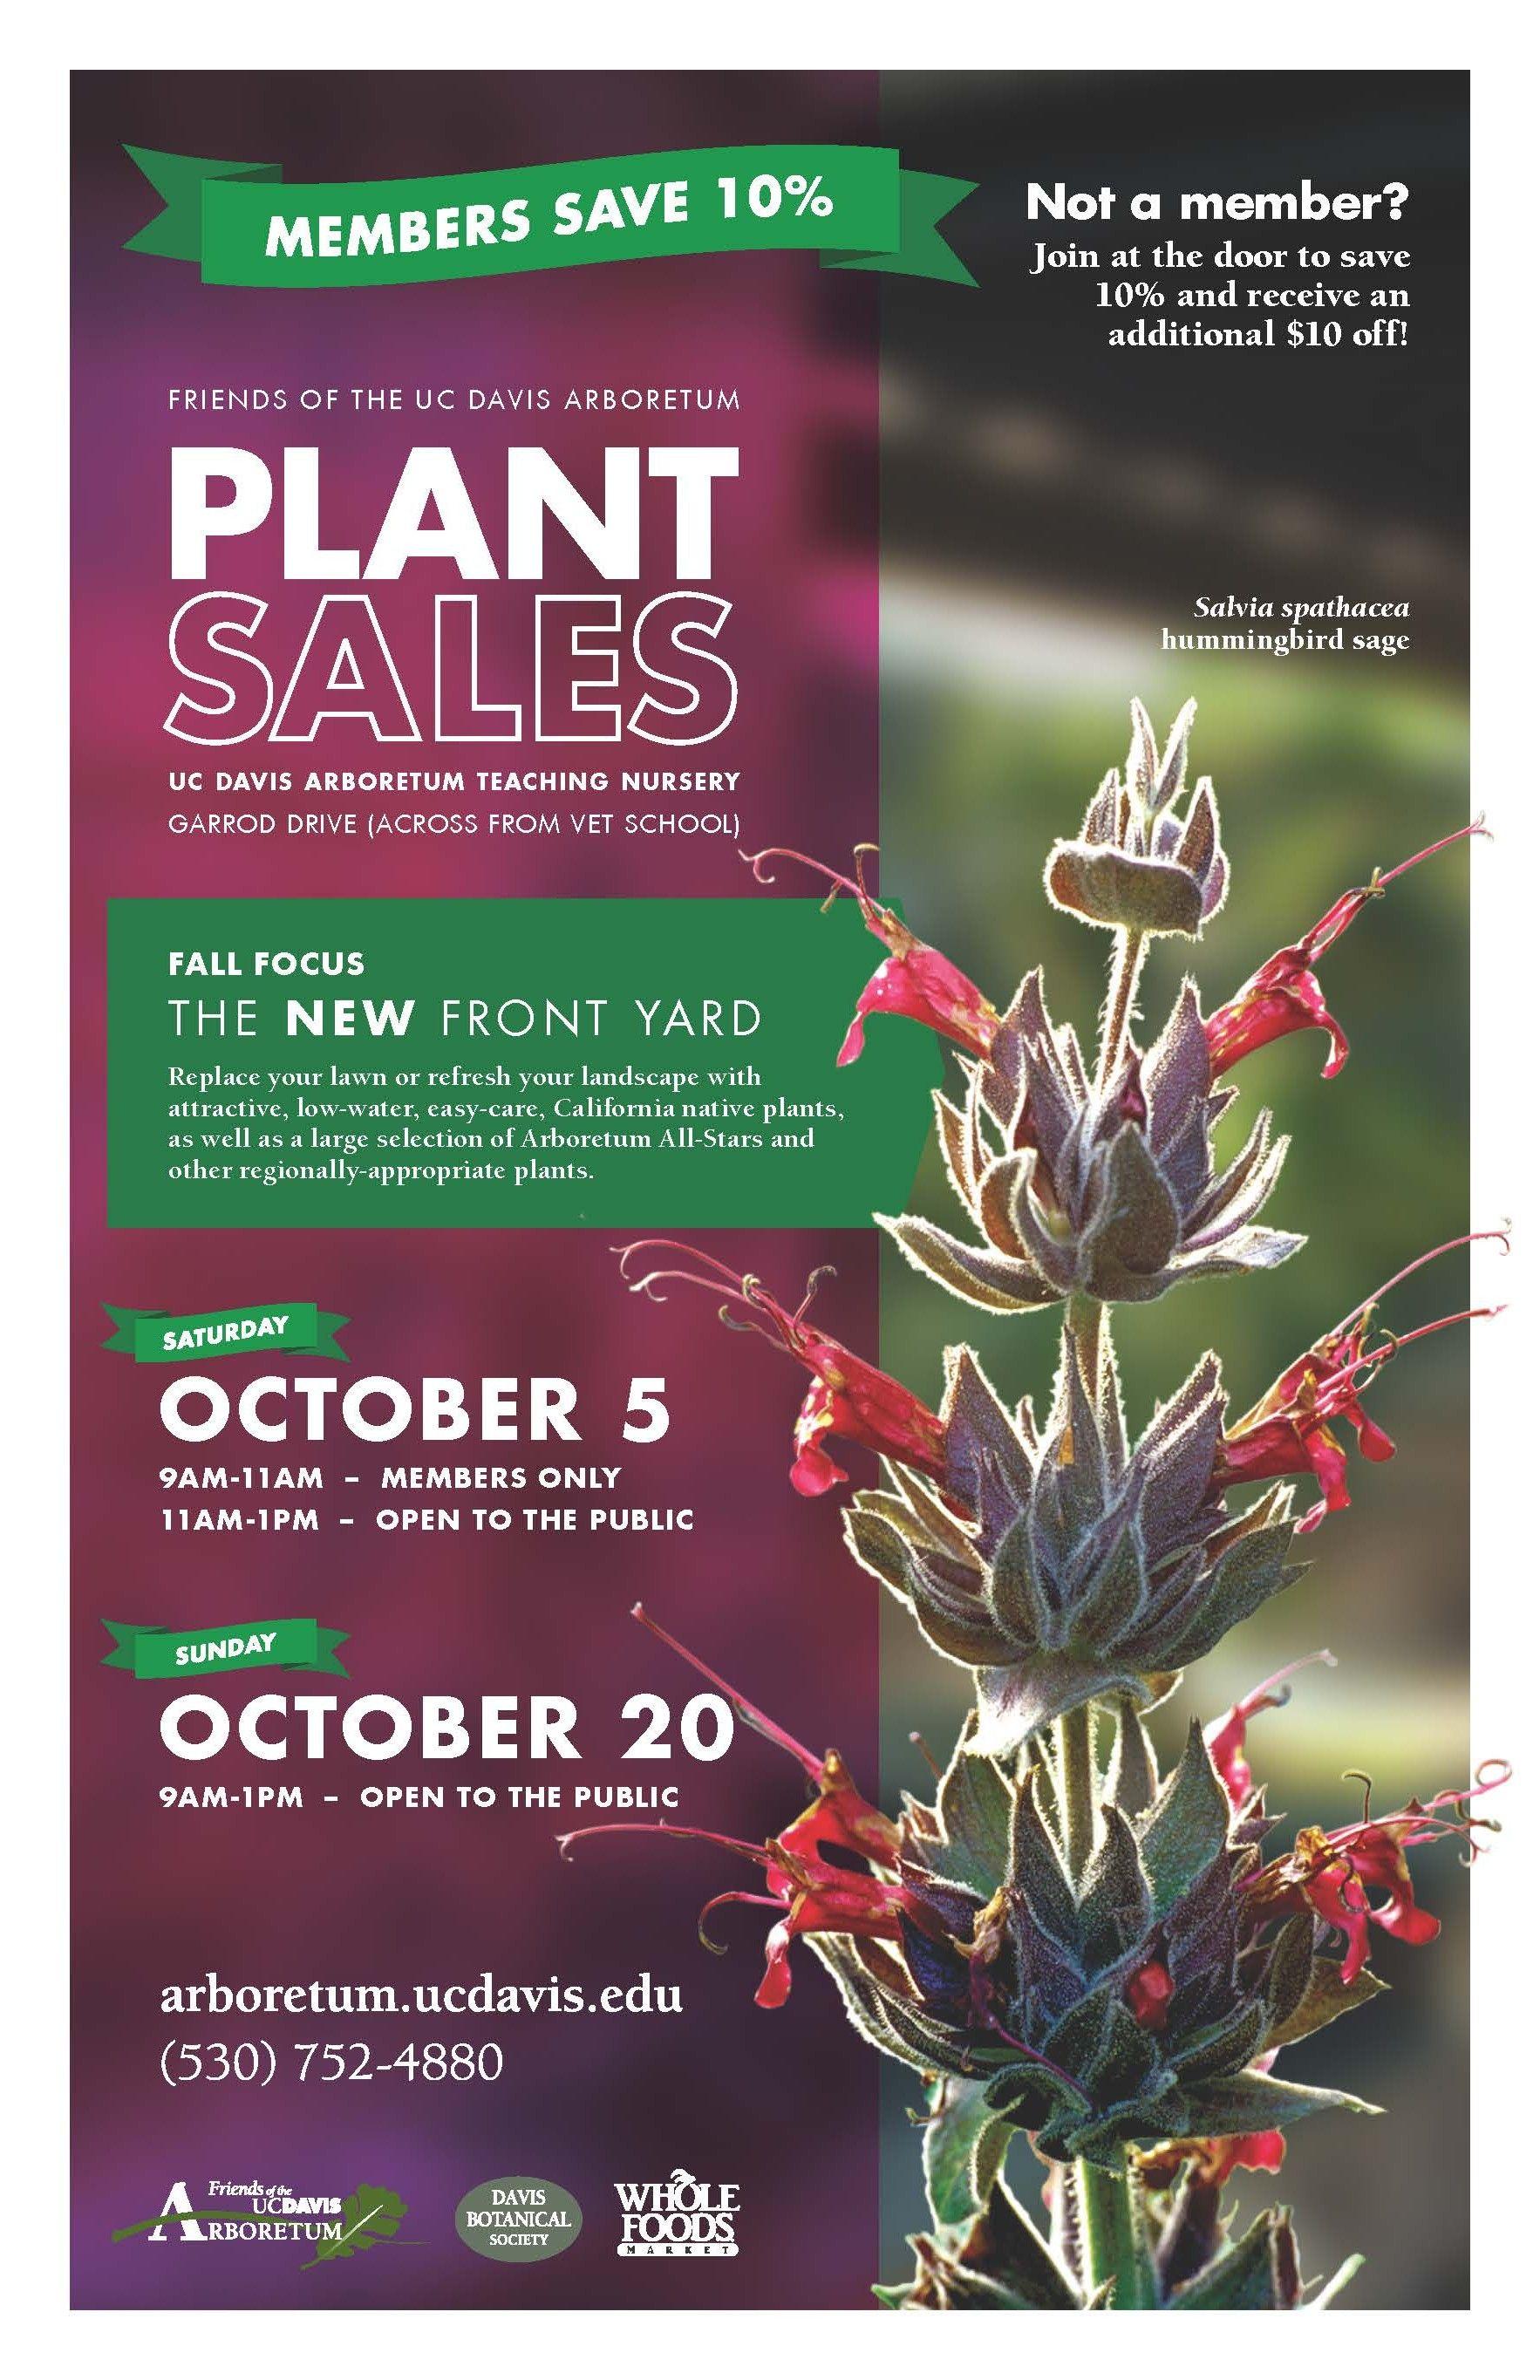 de40022aa7d1648b5e3da3f973194ab5 - Washington County Master Gardeners Plant Sale